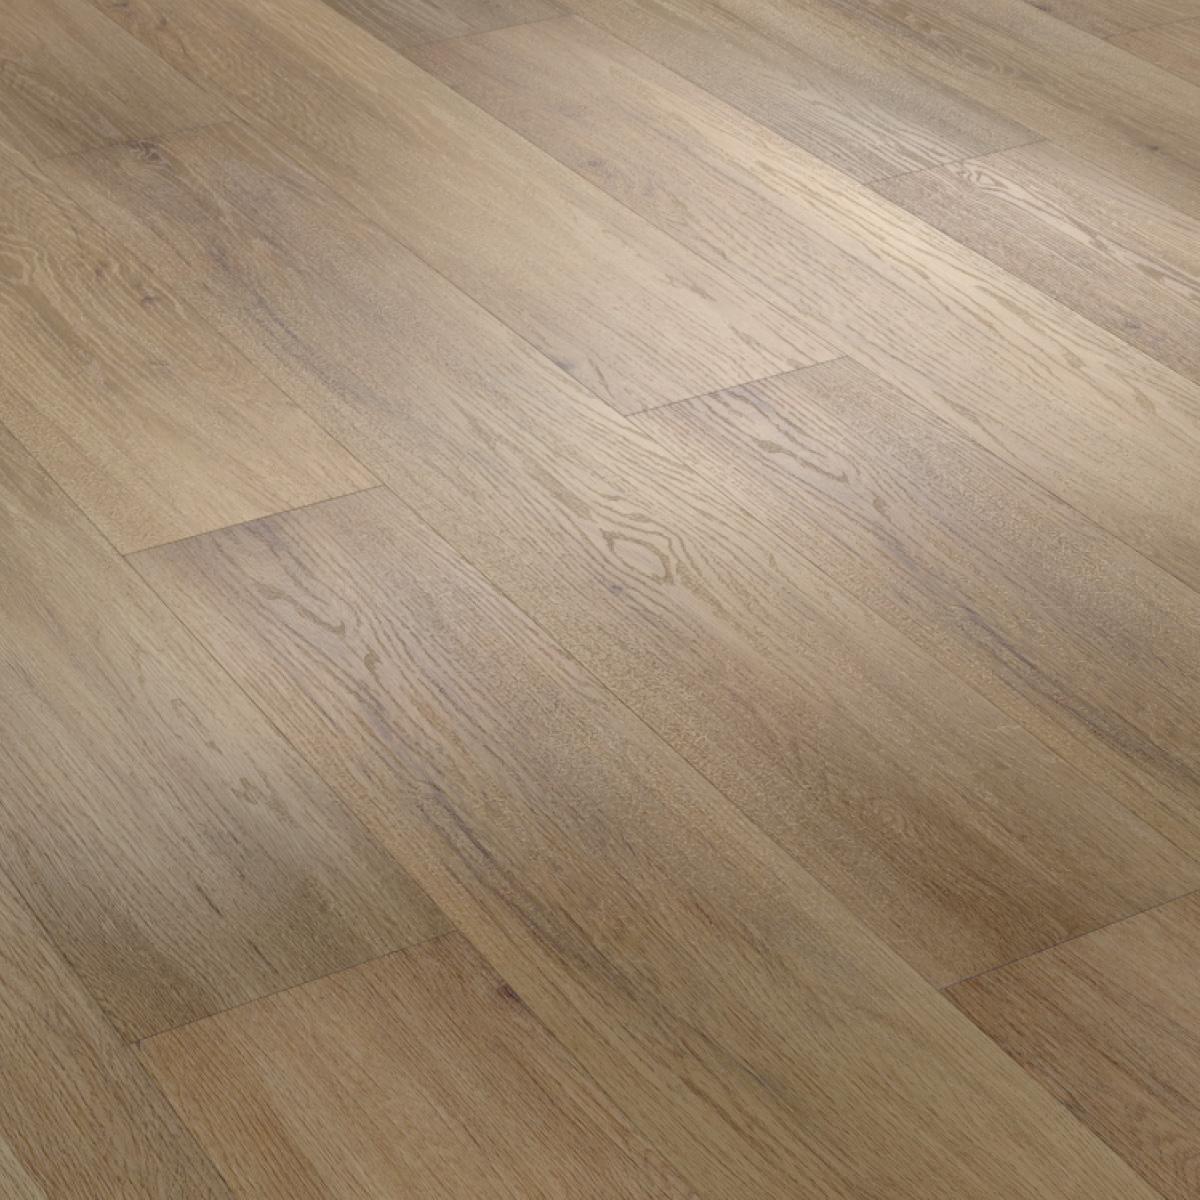 Vinylová podlaha Afirmax HD mineral core - Dub Jersey